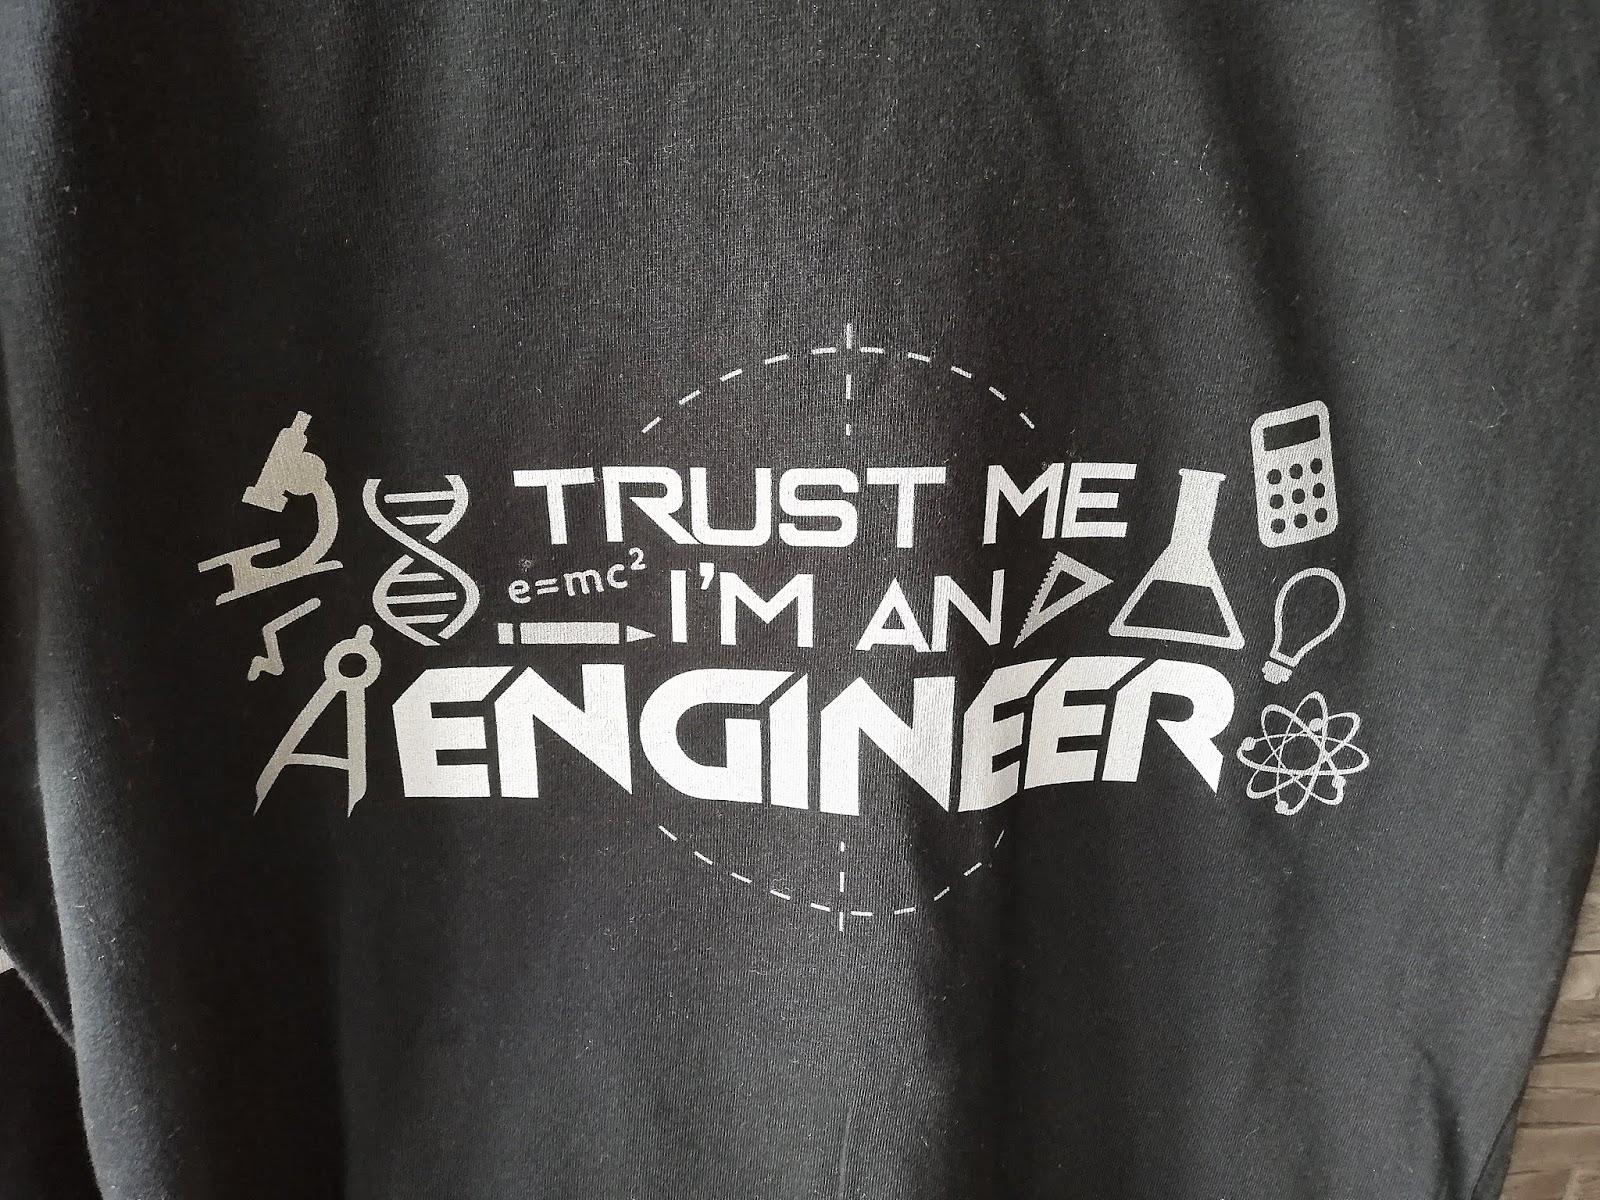 Spersonalizowane koszulki :)